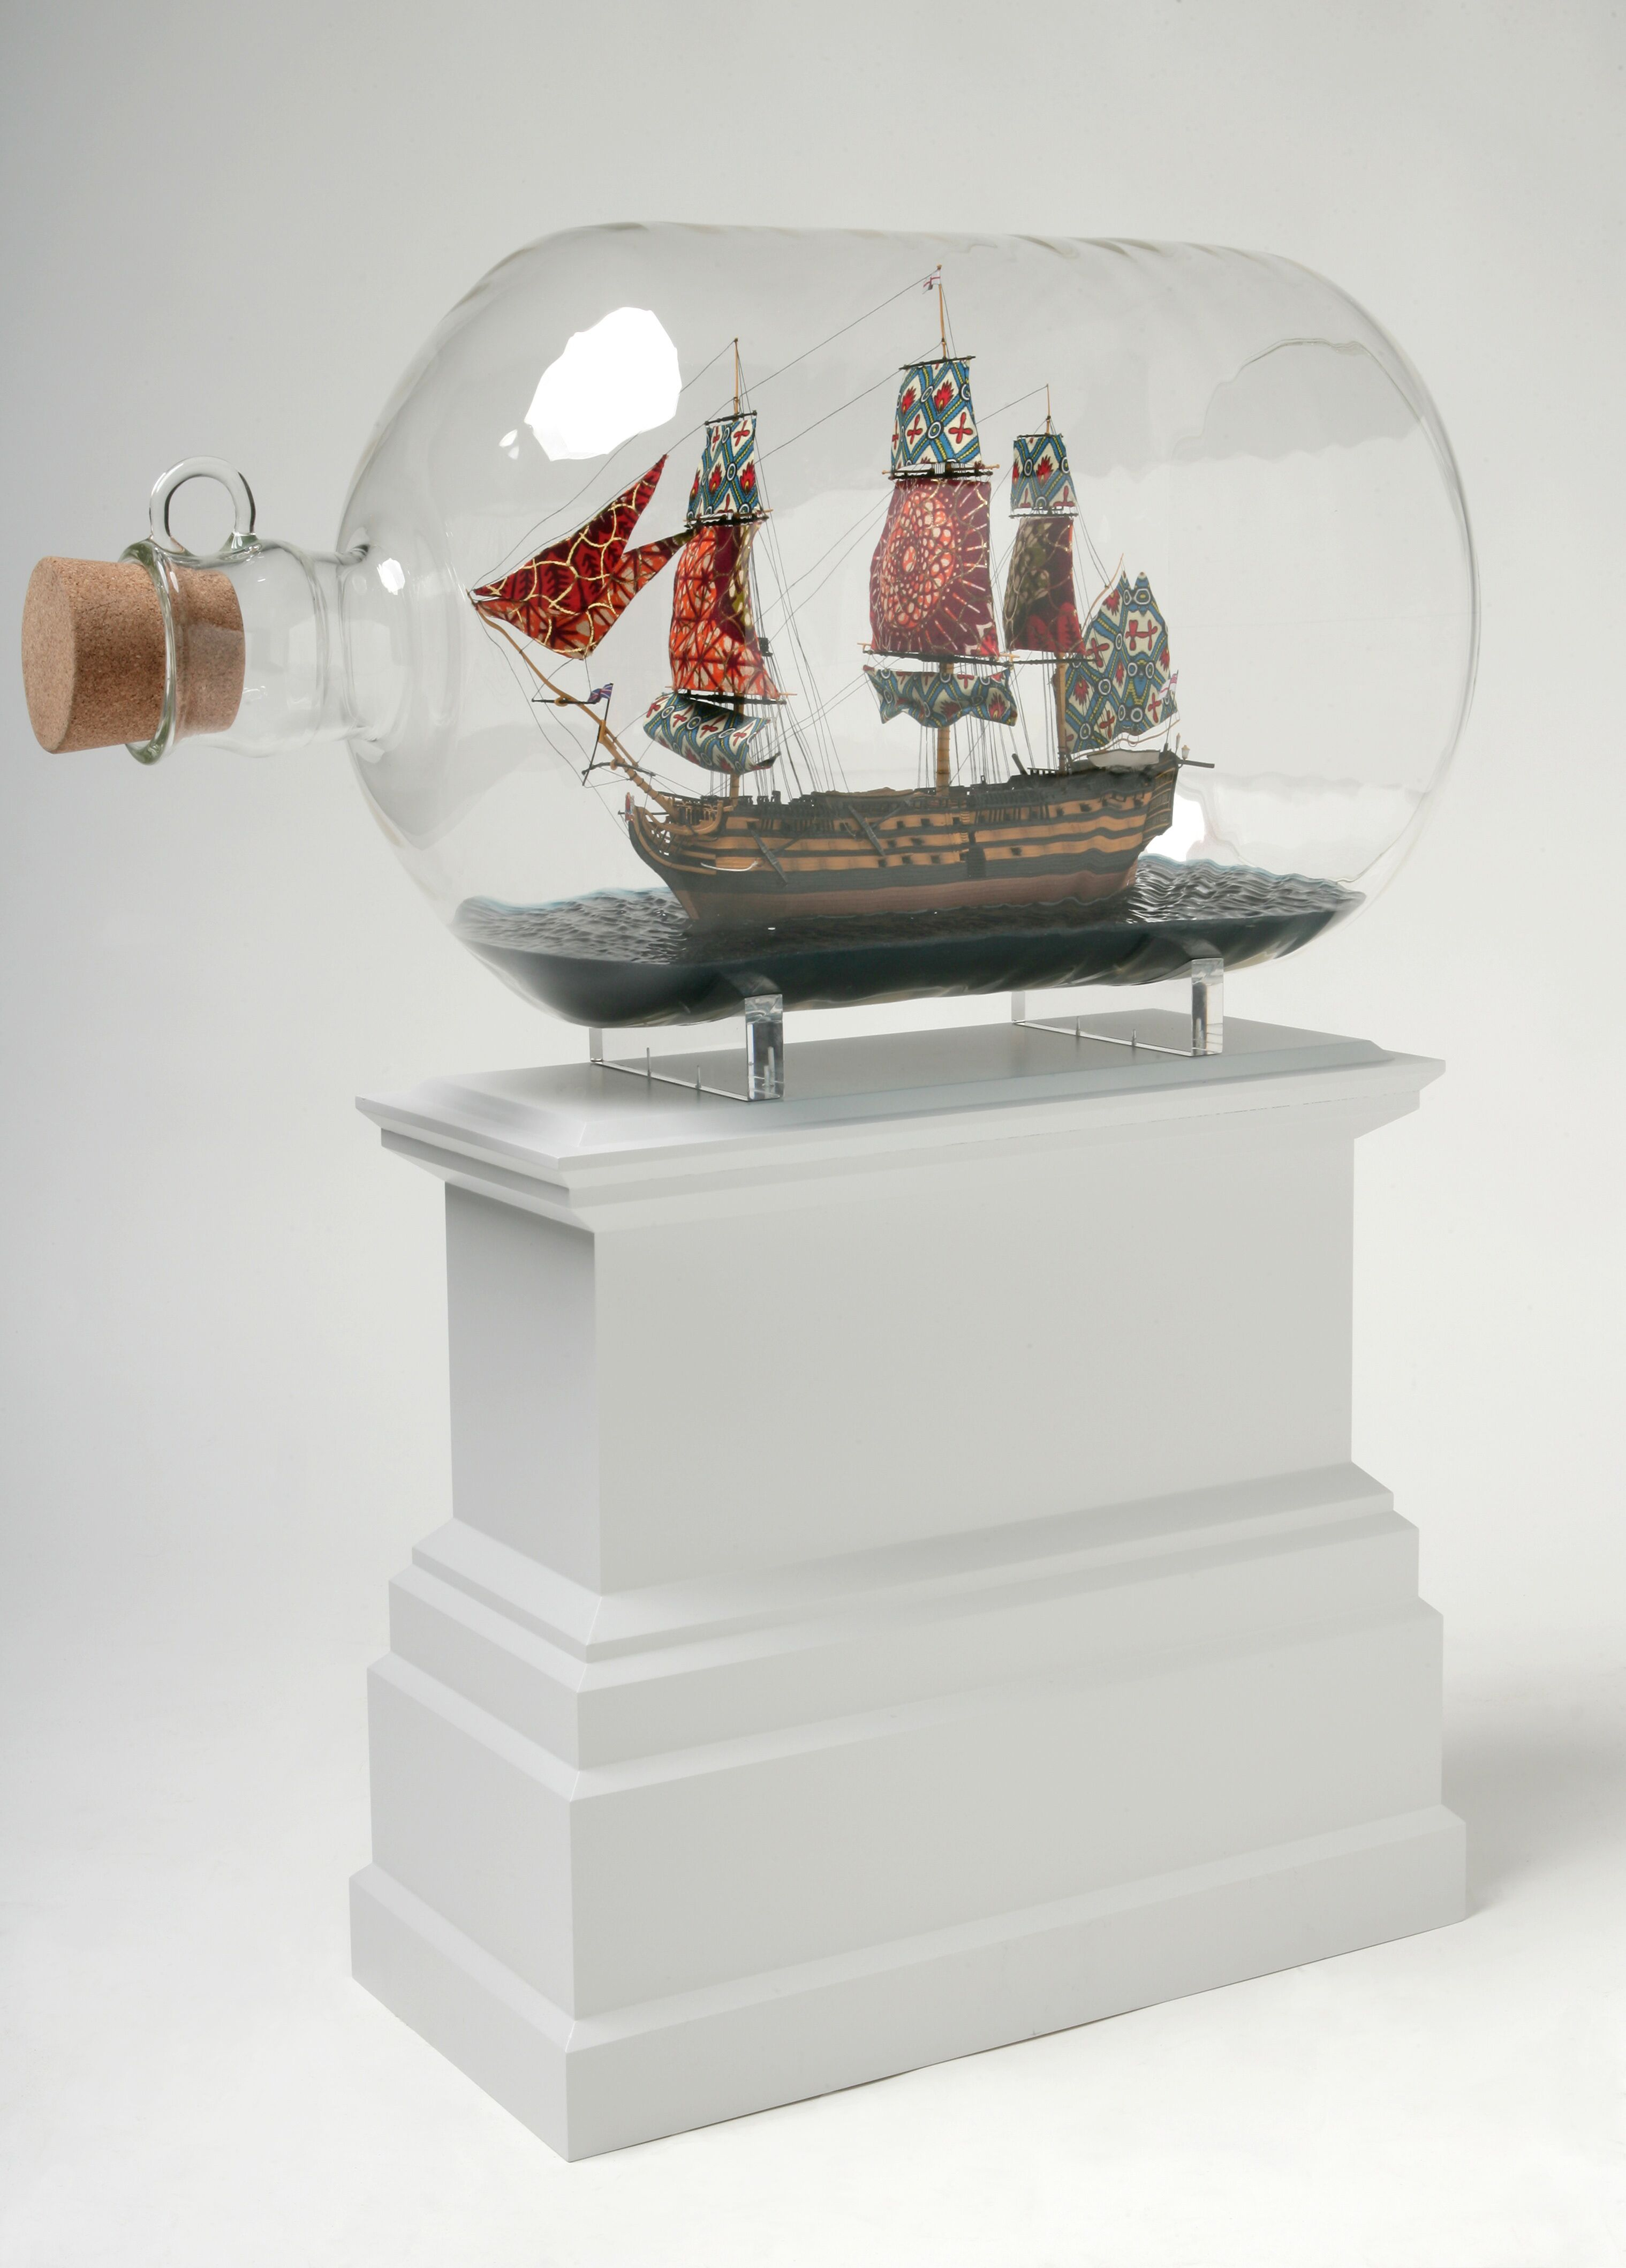 "Yinka Shonibare, ""Nelson's Ship in a Bottle"", 2007. Copyright Yinka Shonibare, courtesy of Moody Art Center."